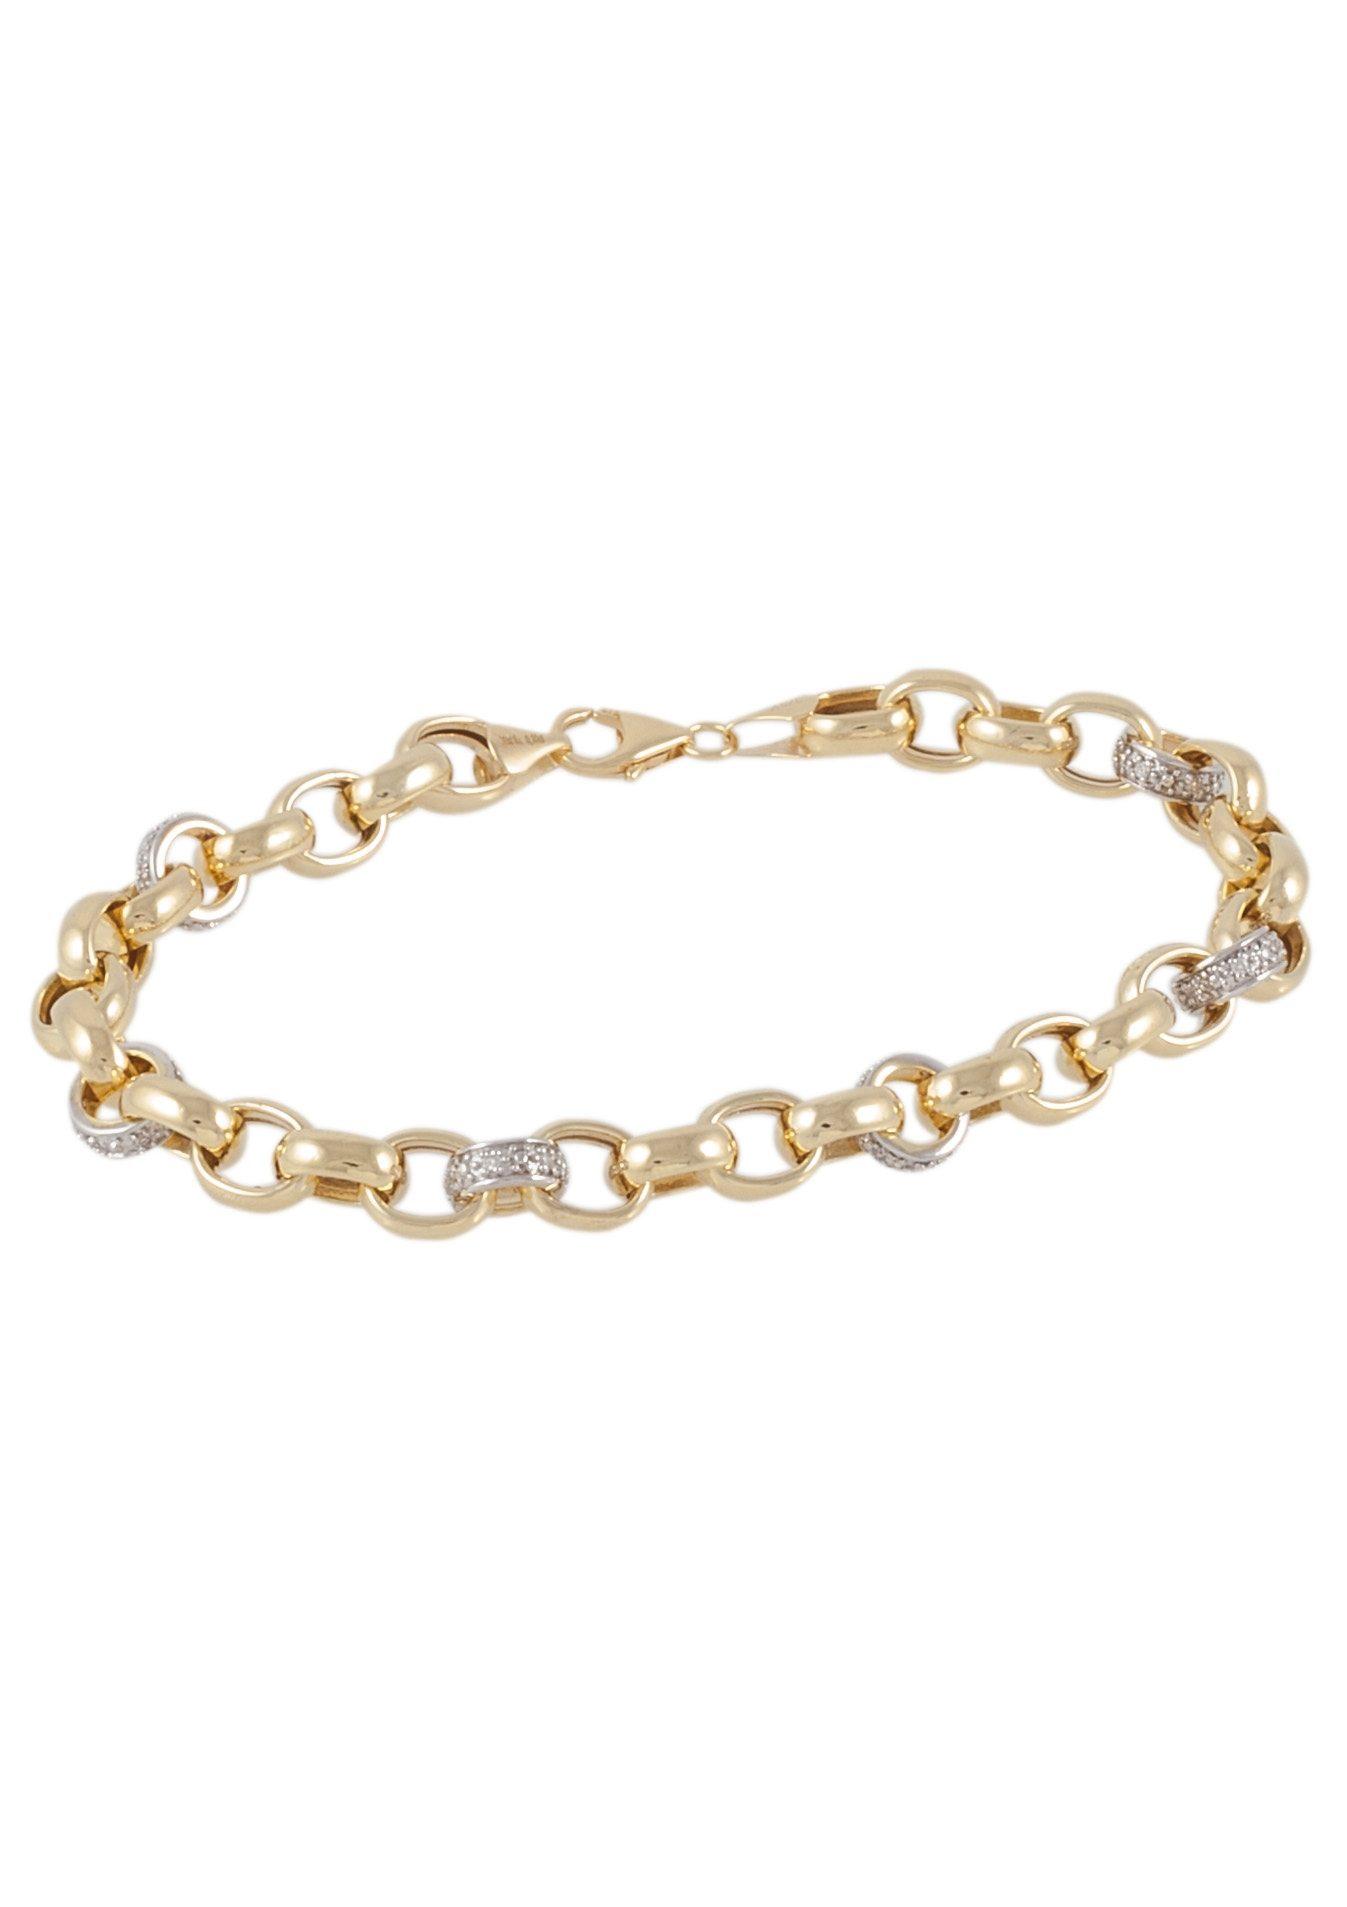 Vivance Jewels Armschmuck: Armband in Erbskettengliederung mit Diamanten